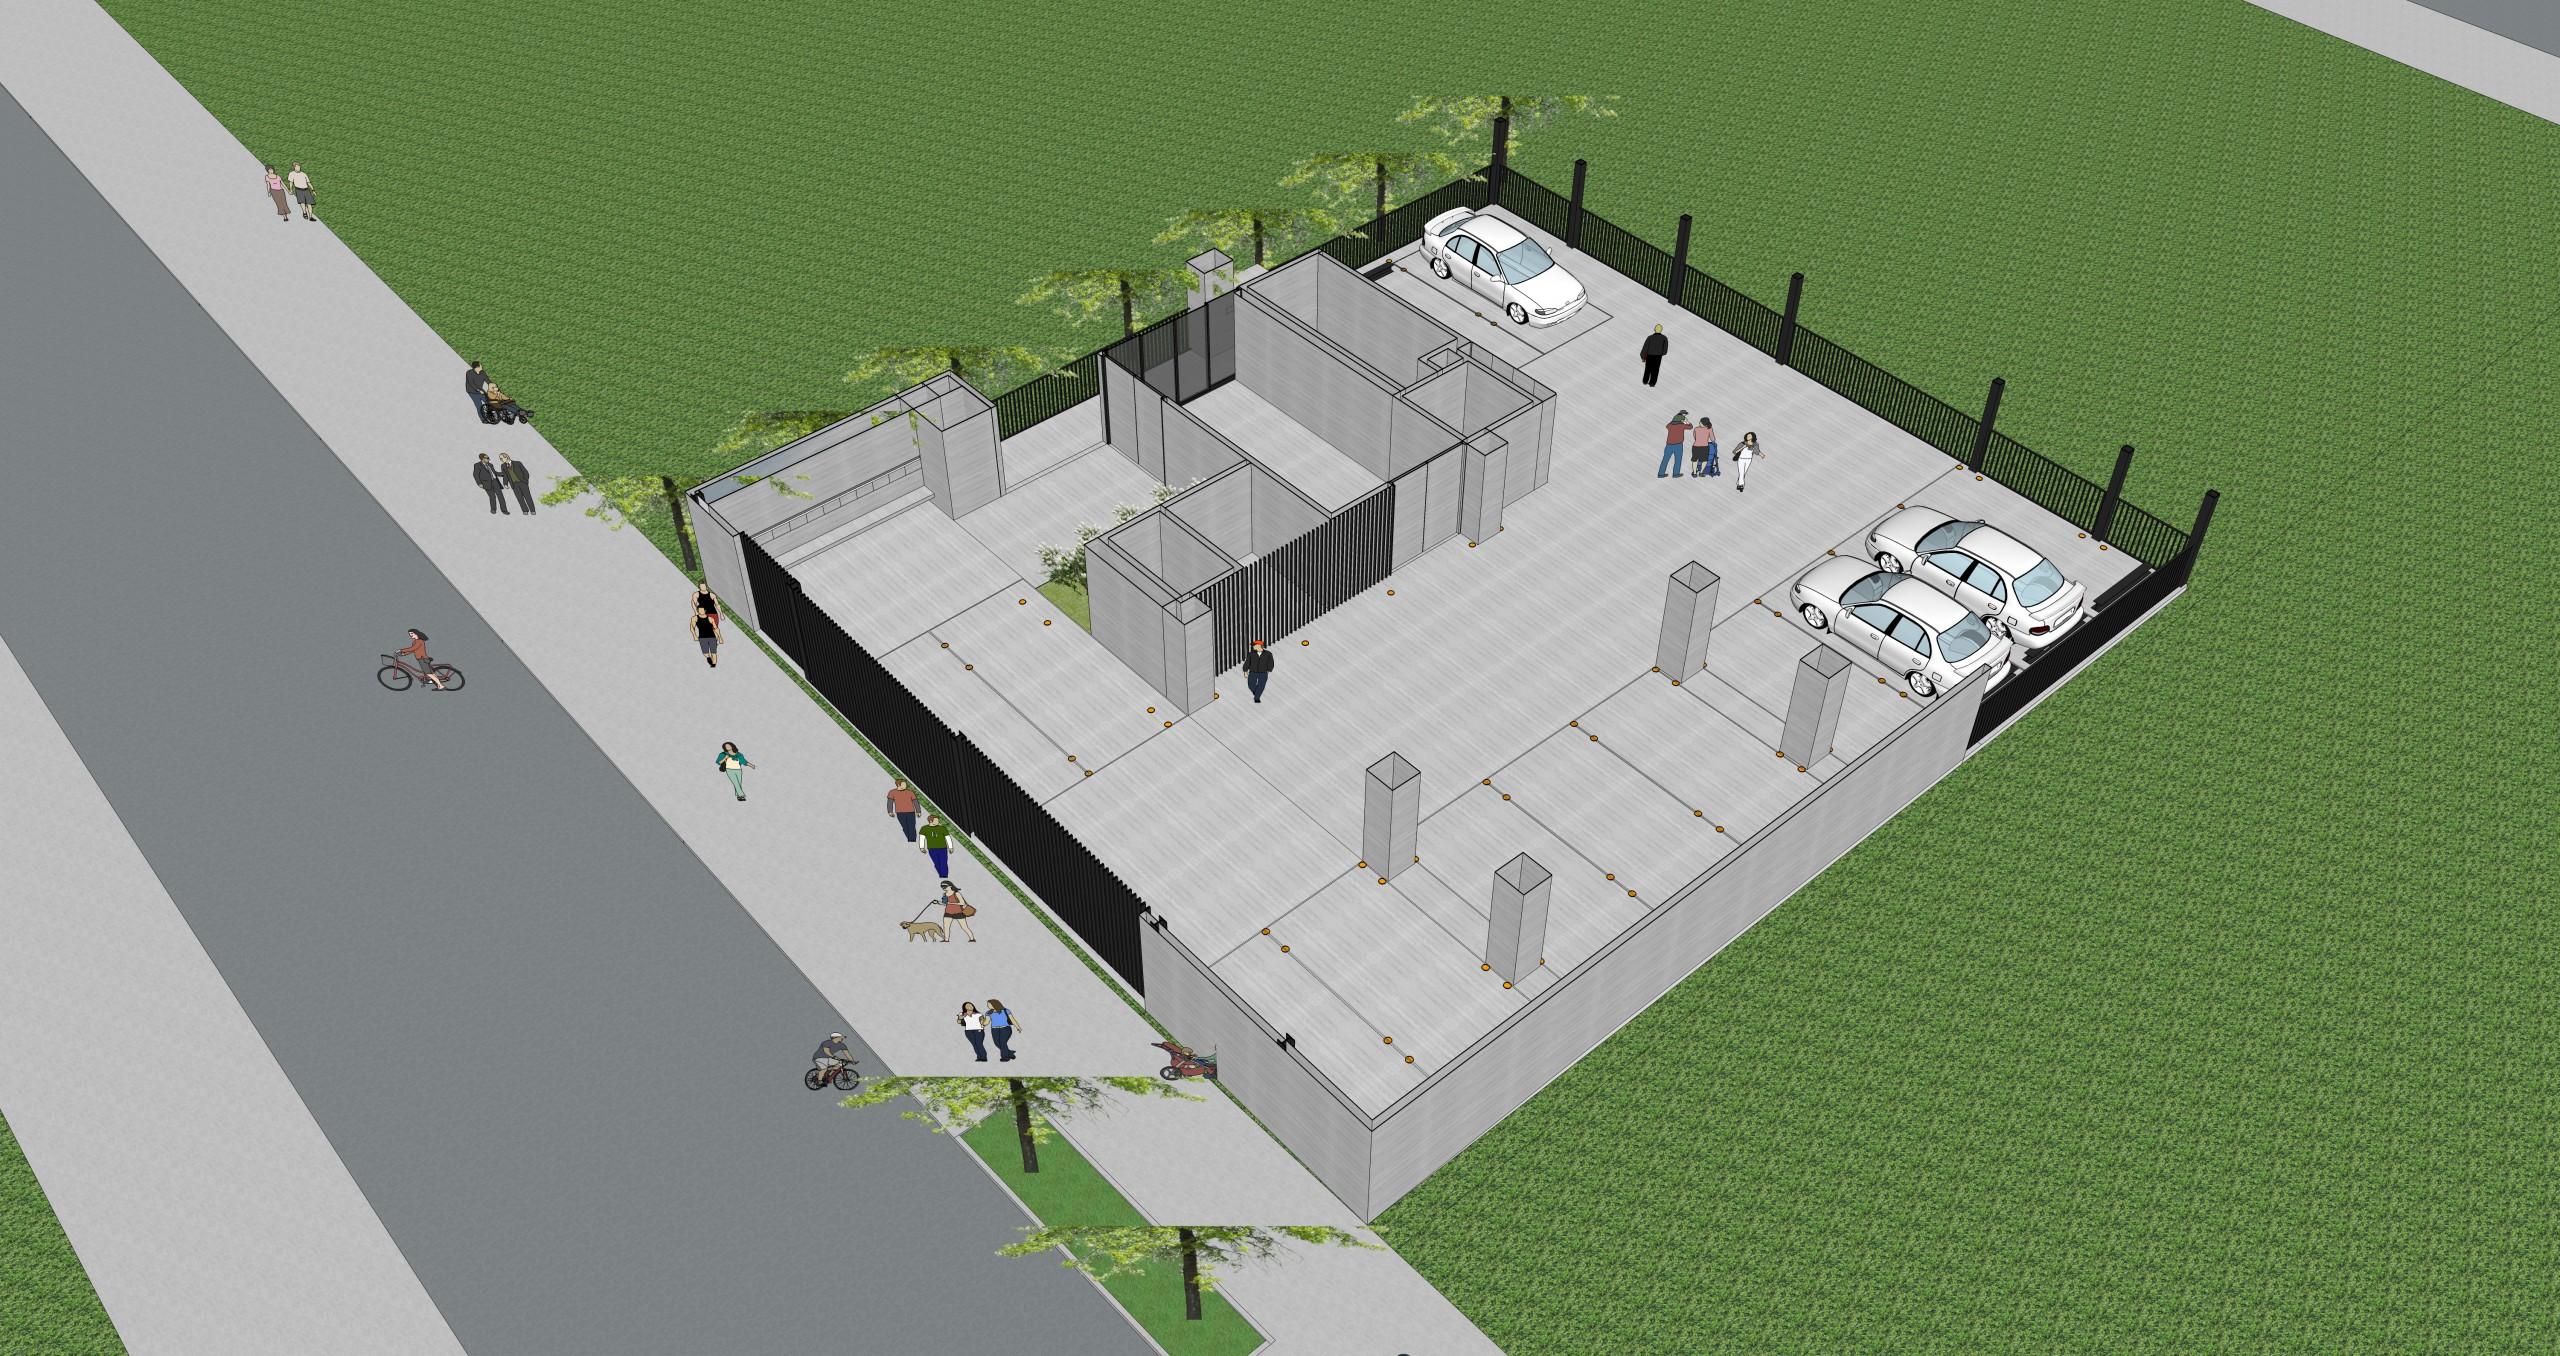 德築-DEZU-project-林口十現-architecture-building-perspective-2